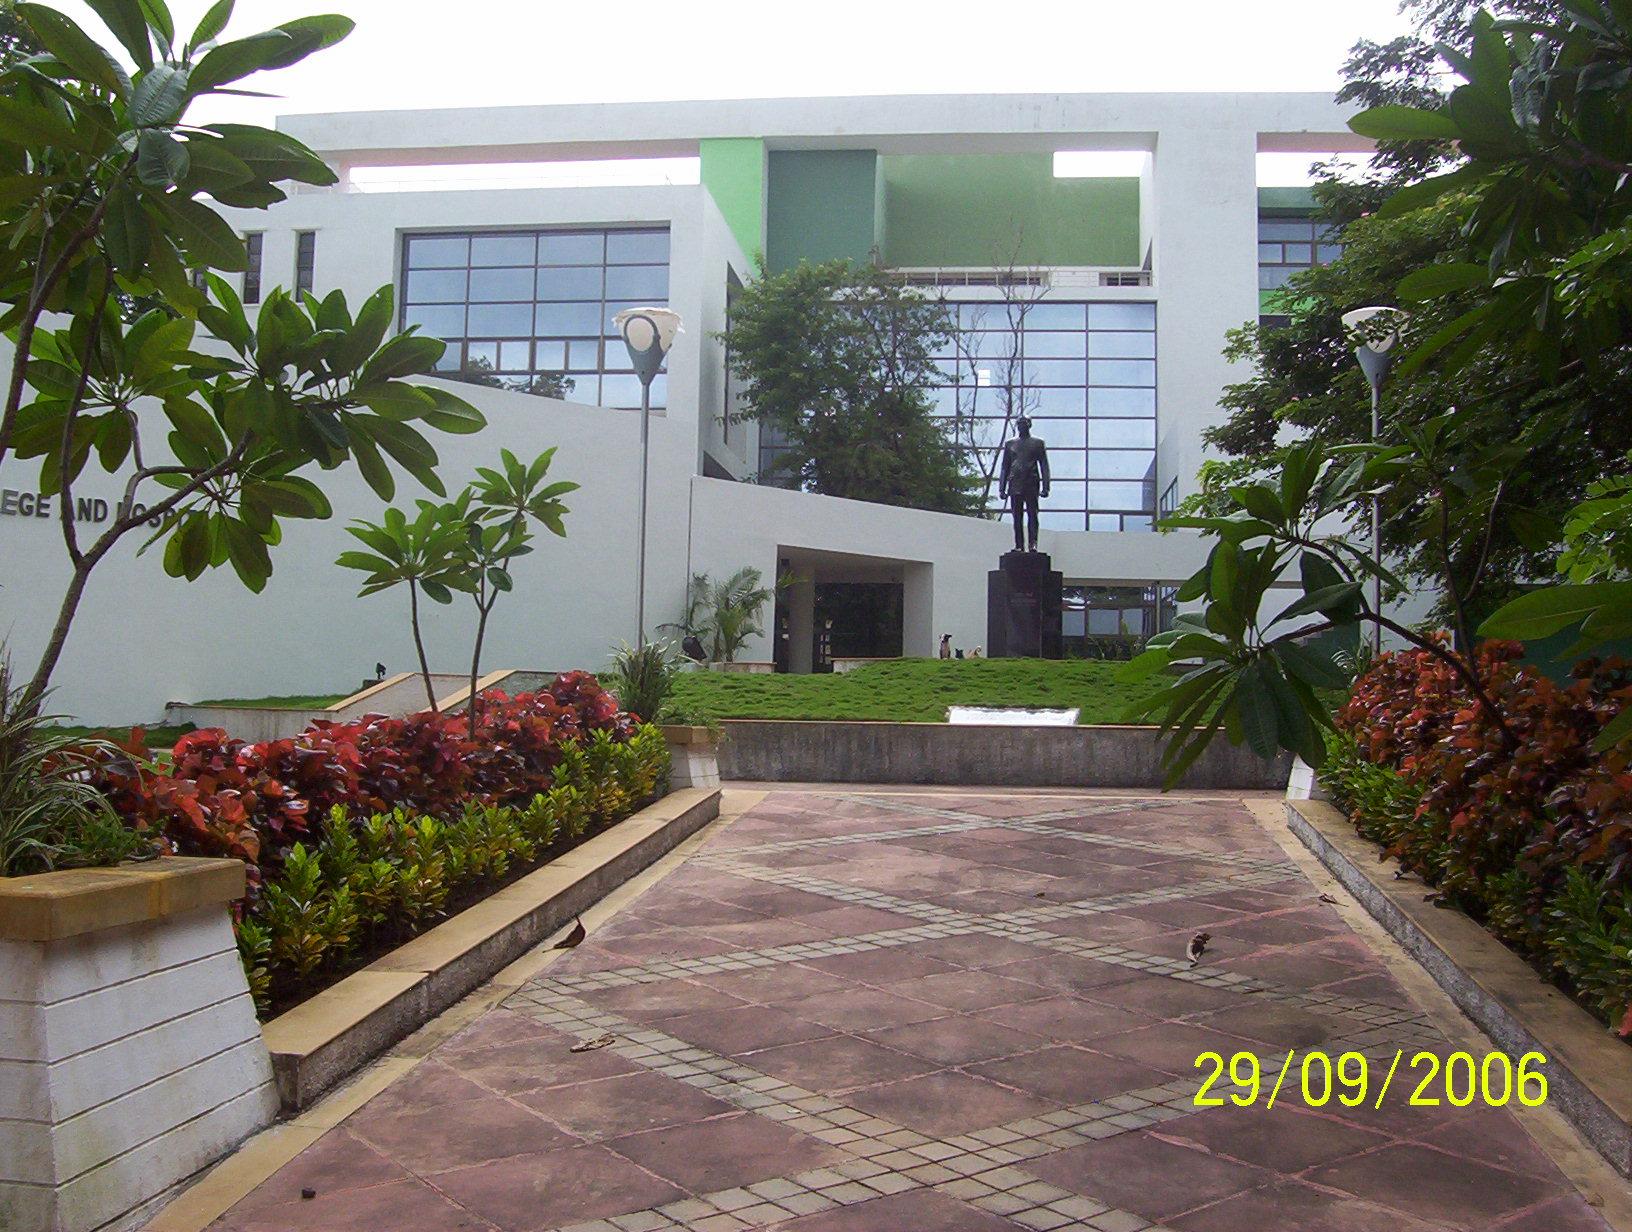 Goa medical college bambolim goa tenders dating